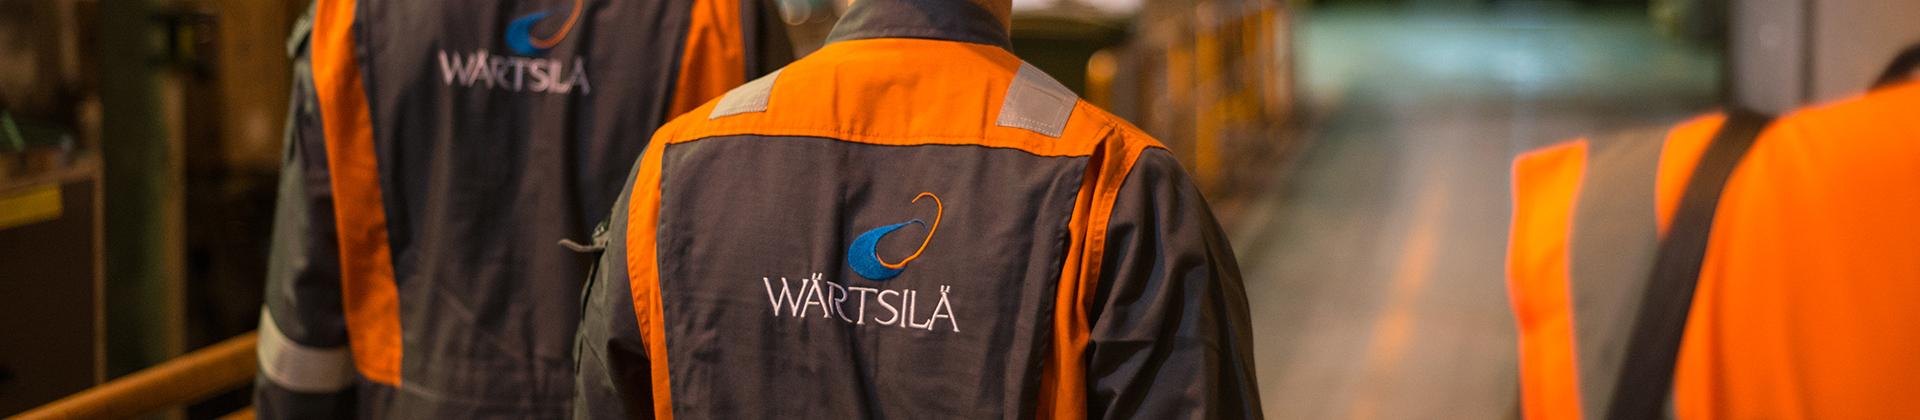 wartsila-seals-bearings-field-service-engineers